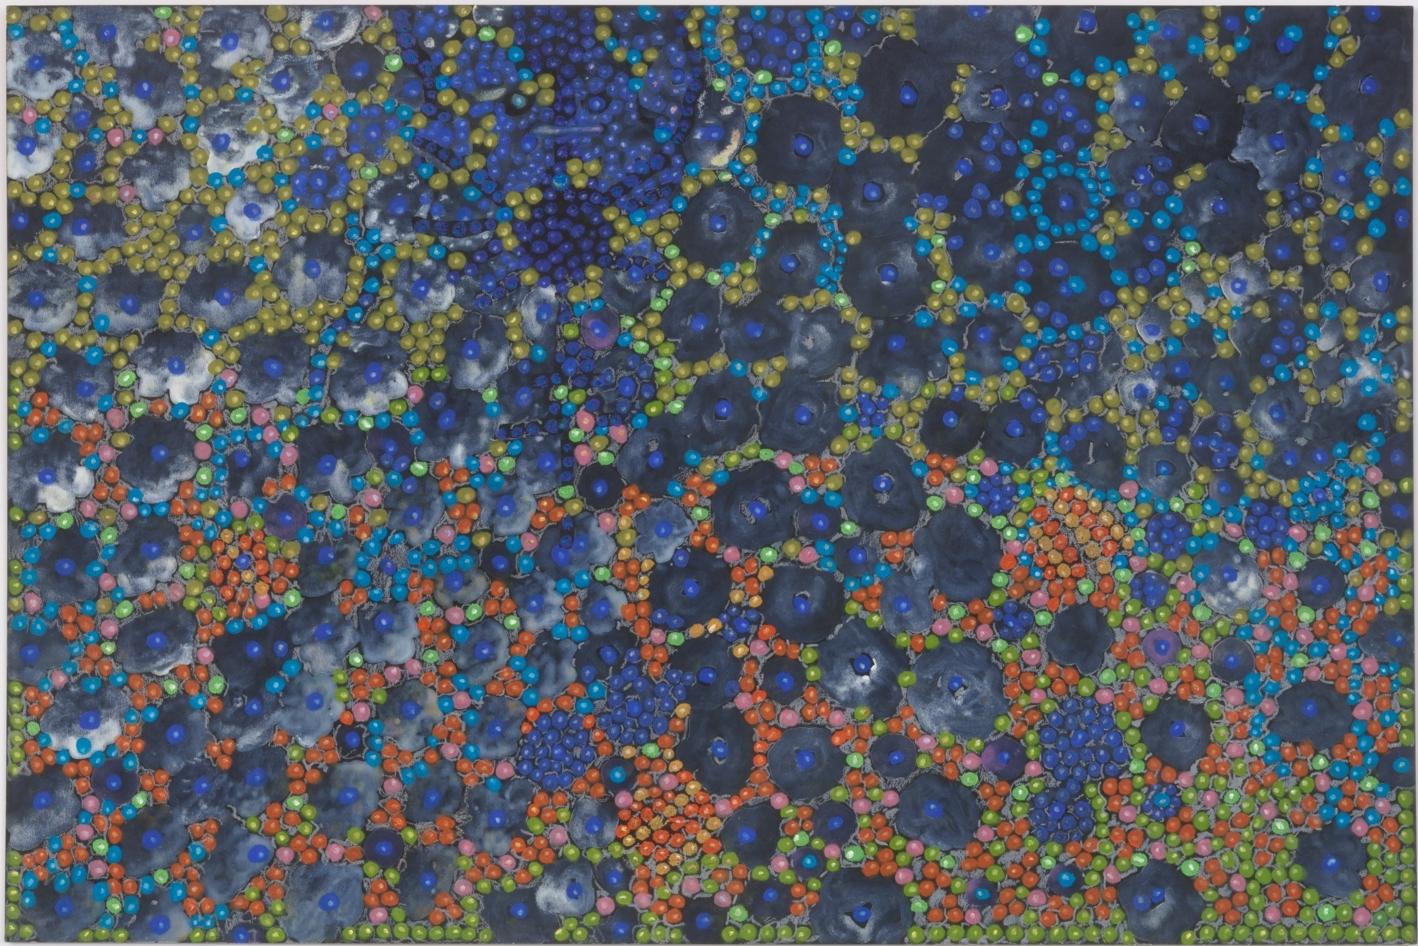 Untitled, c. 1969